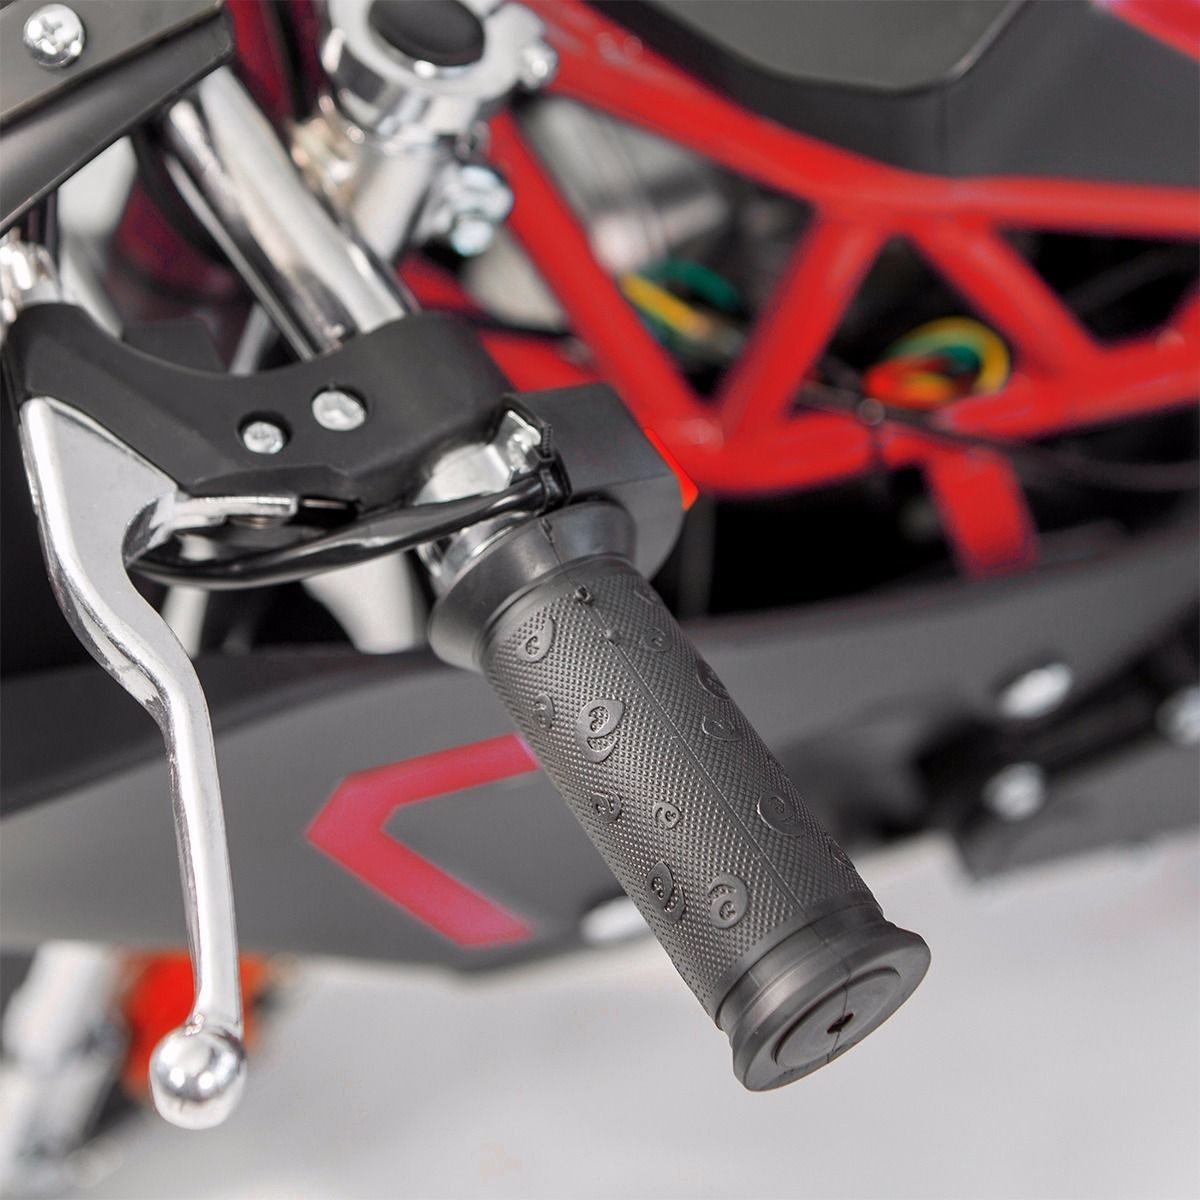 XtremepowerUS-Gas-Pocket-Bike-Motor-Bike-Scooter-40cc-Epa-Engine-Motorcycle thumbnail 25